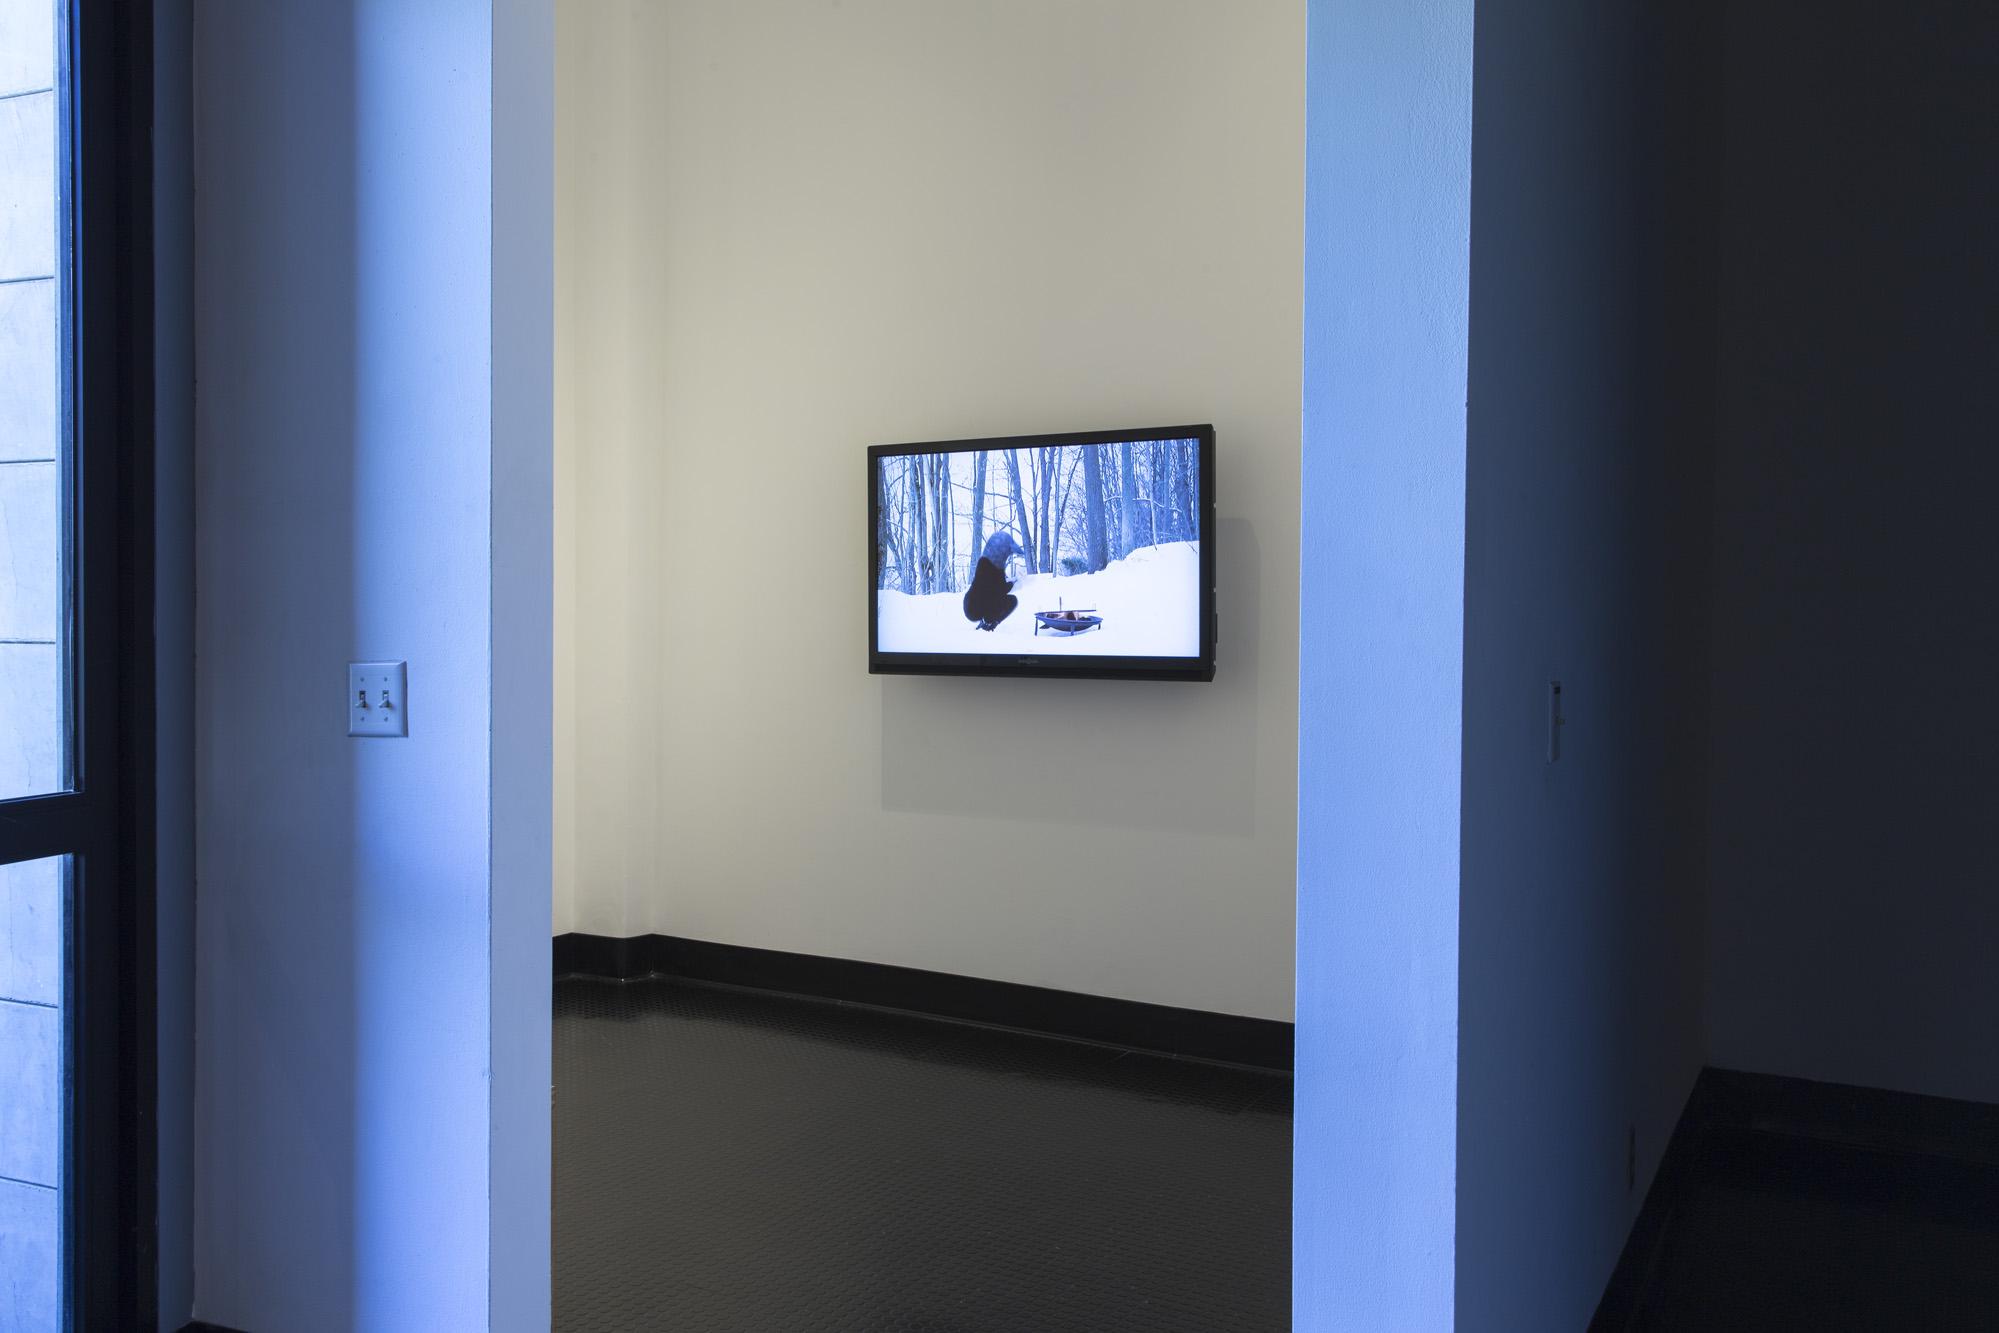 FLASH! contemporary art series